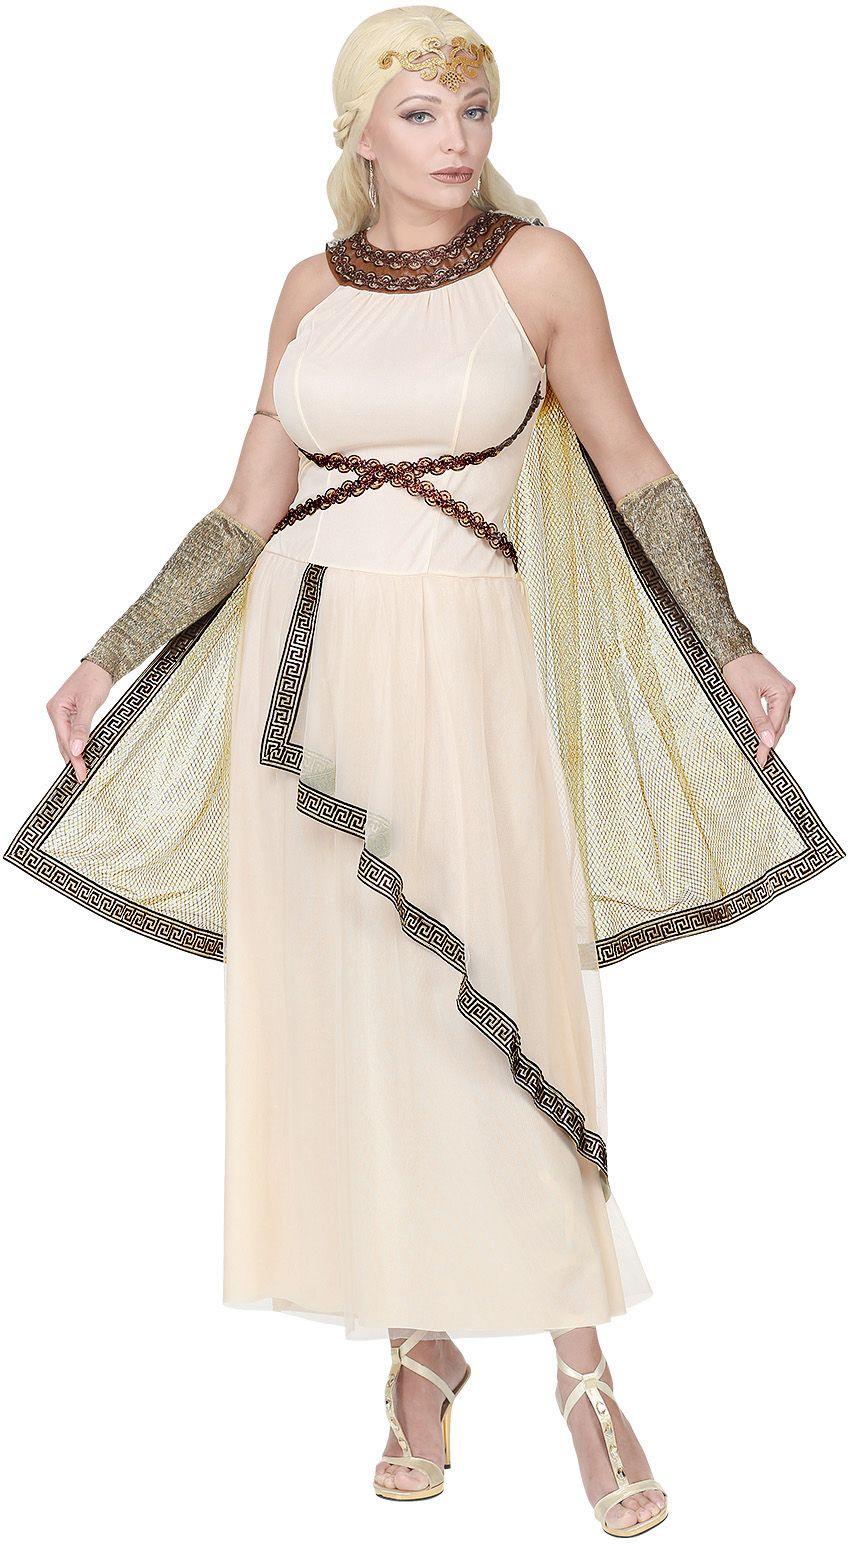 Witte jurk Romeinse godin